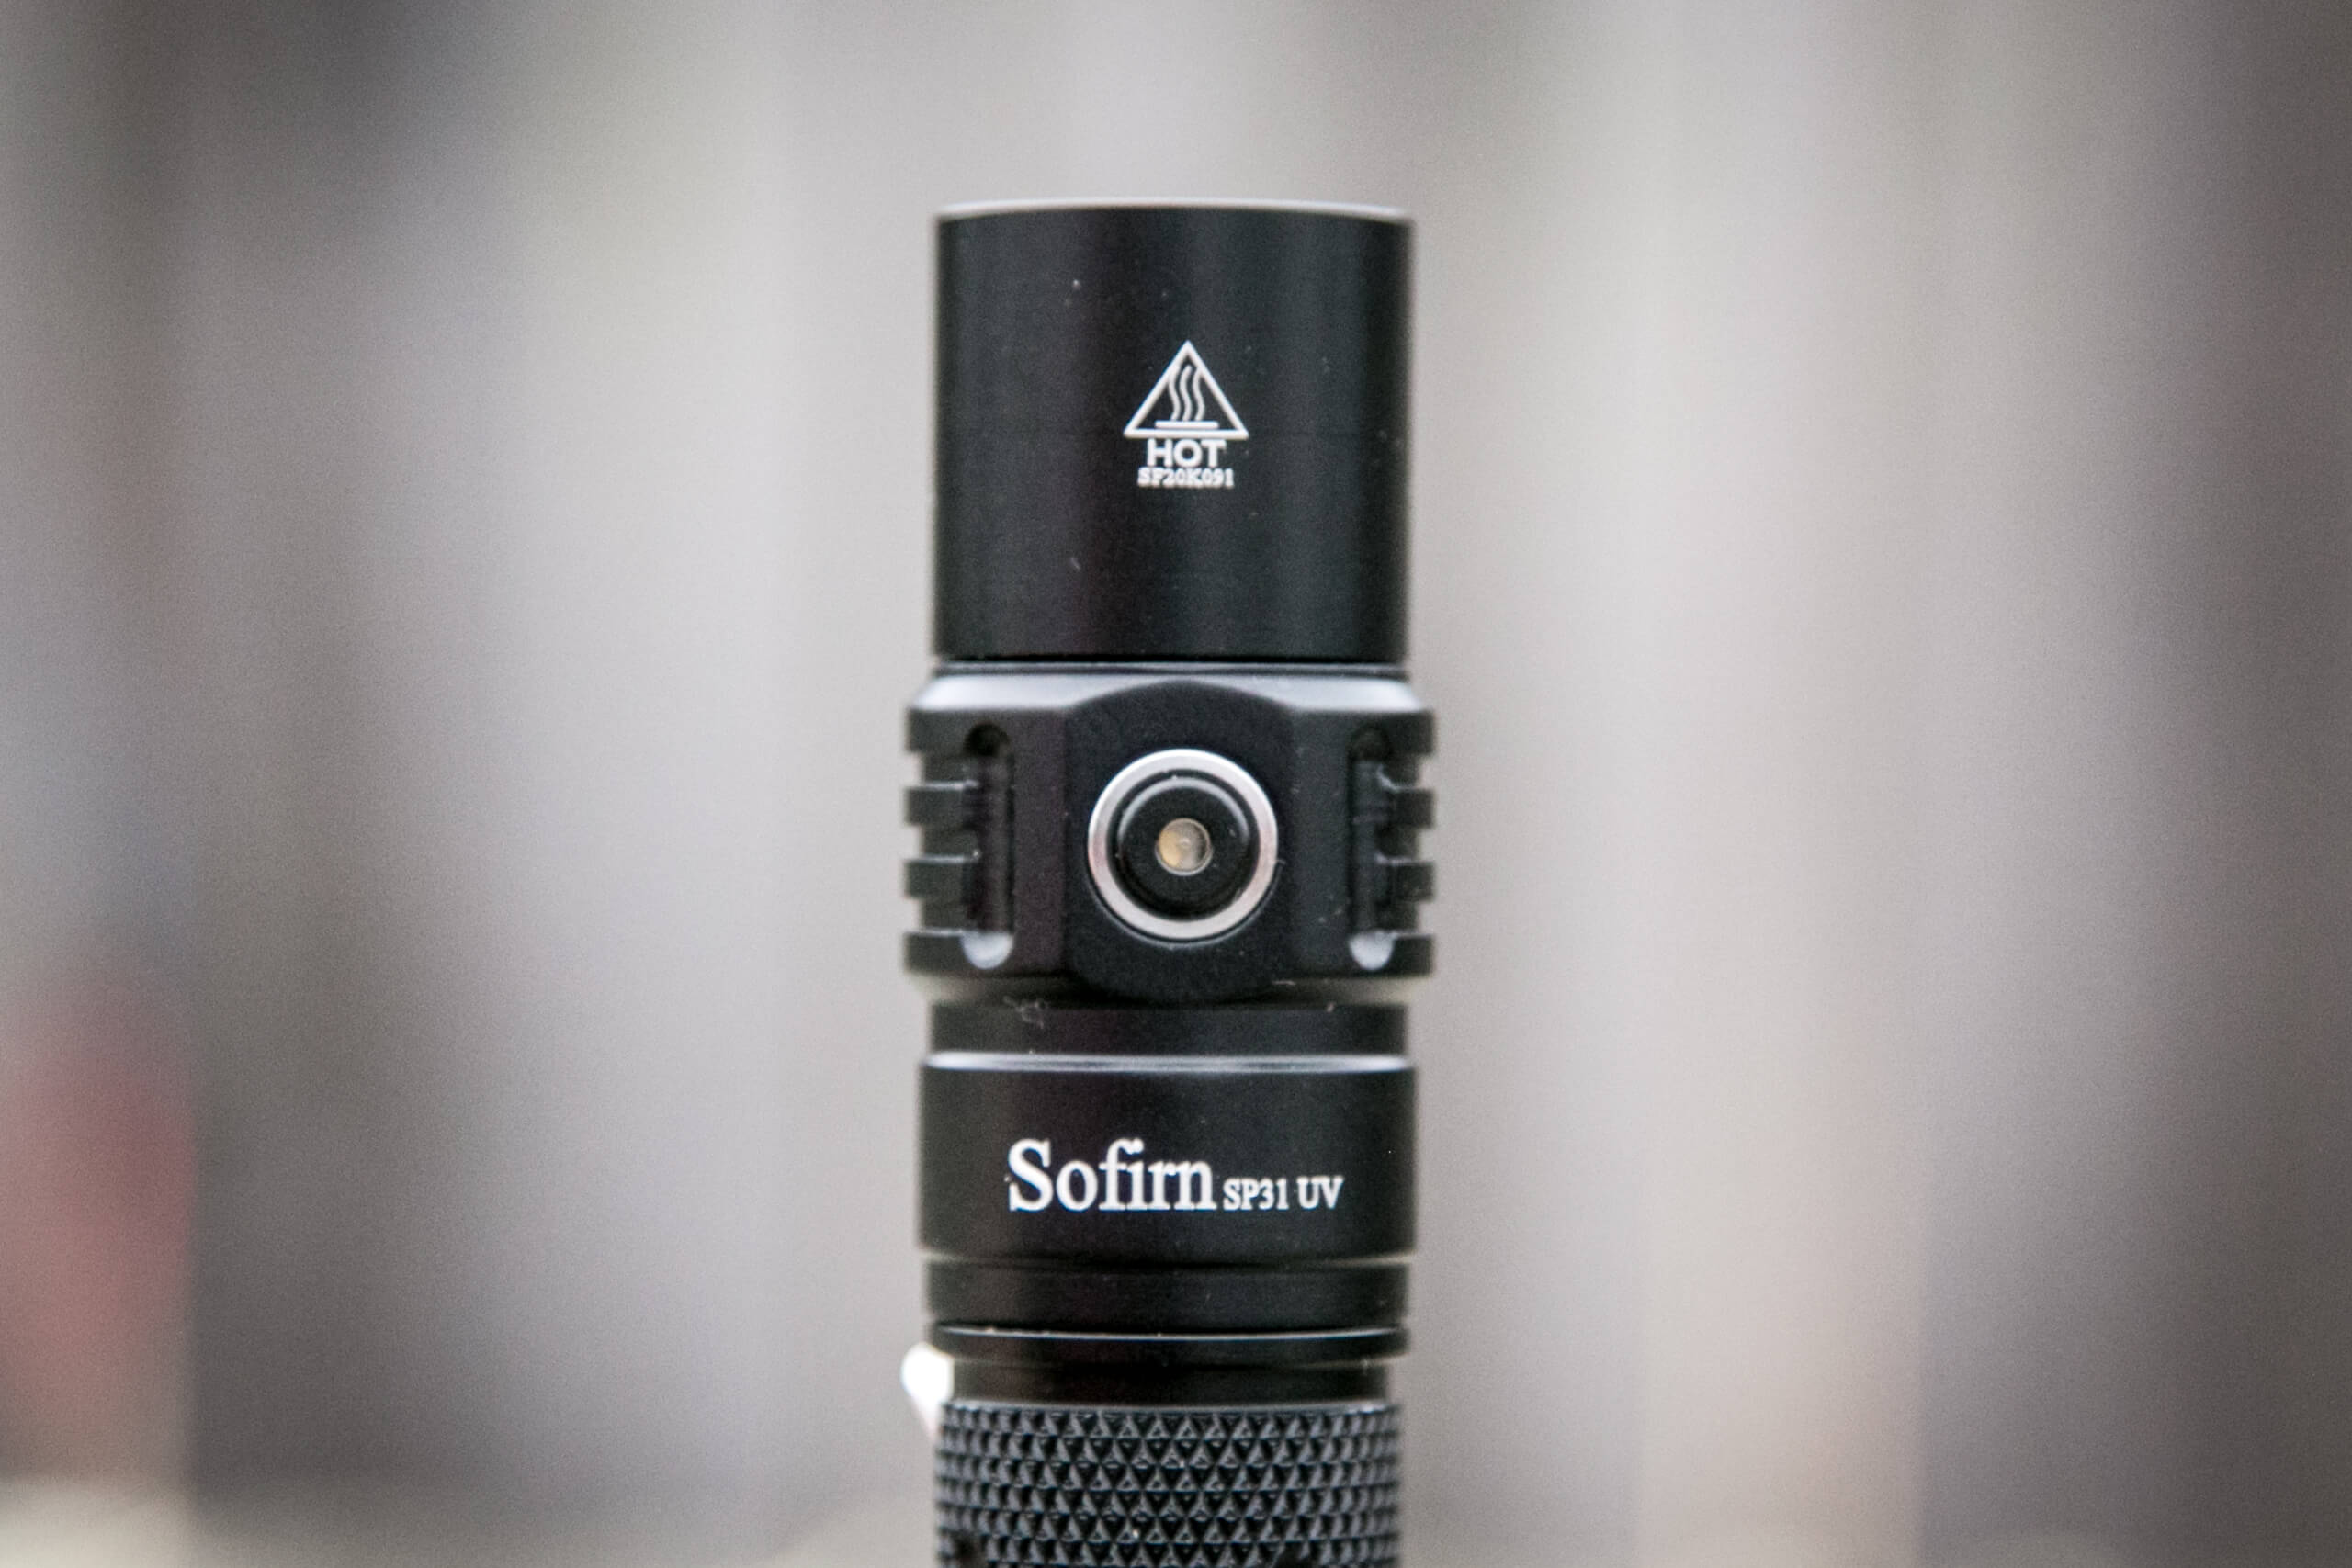 sofirn sp31uv ultraviolet 18650 flashlight side e-switch